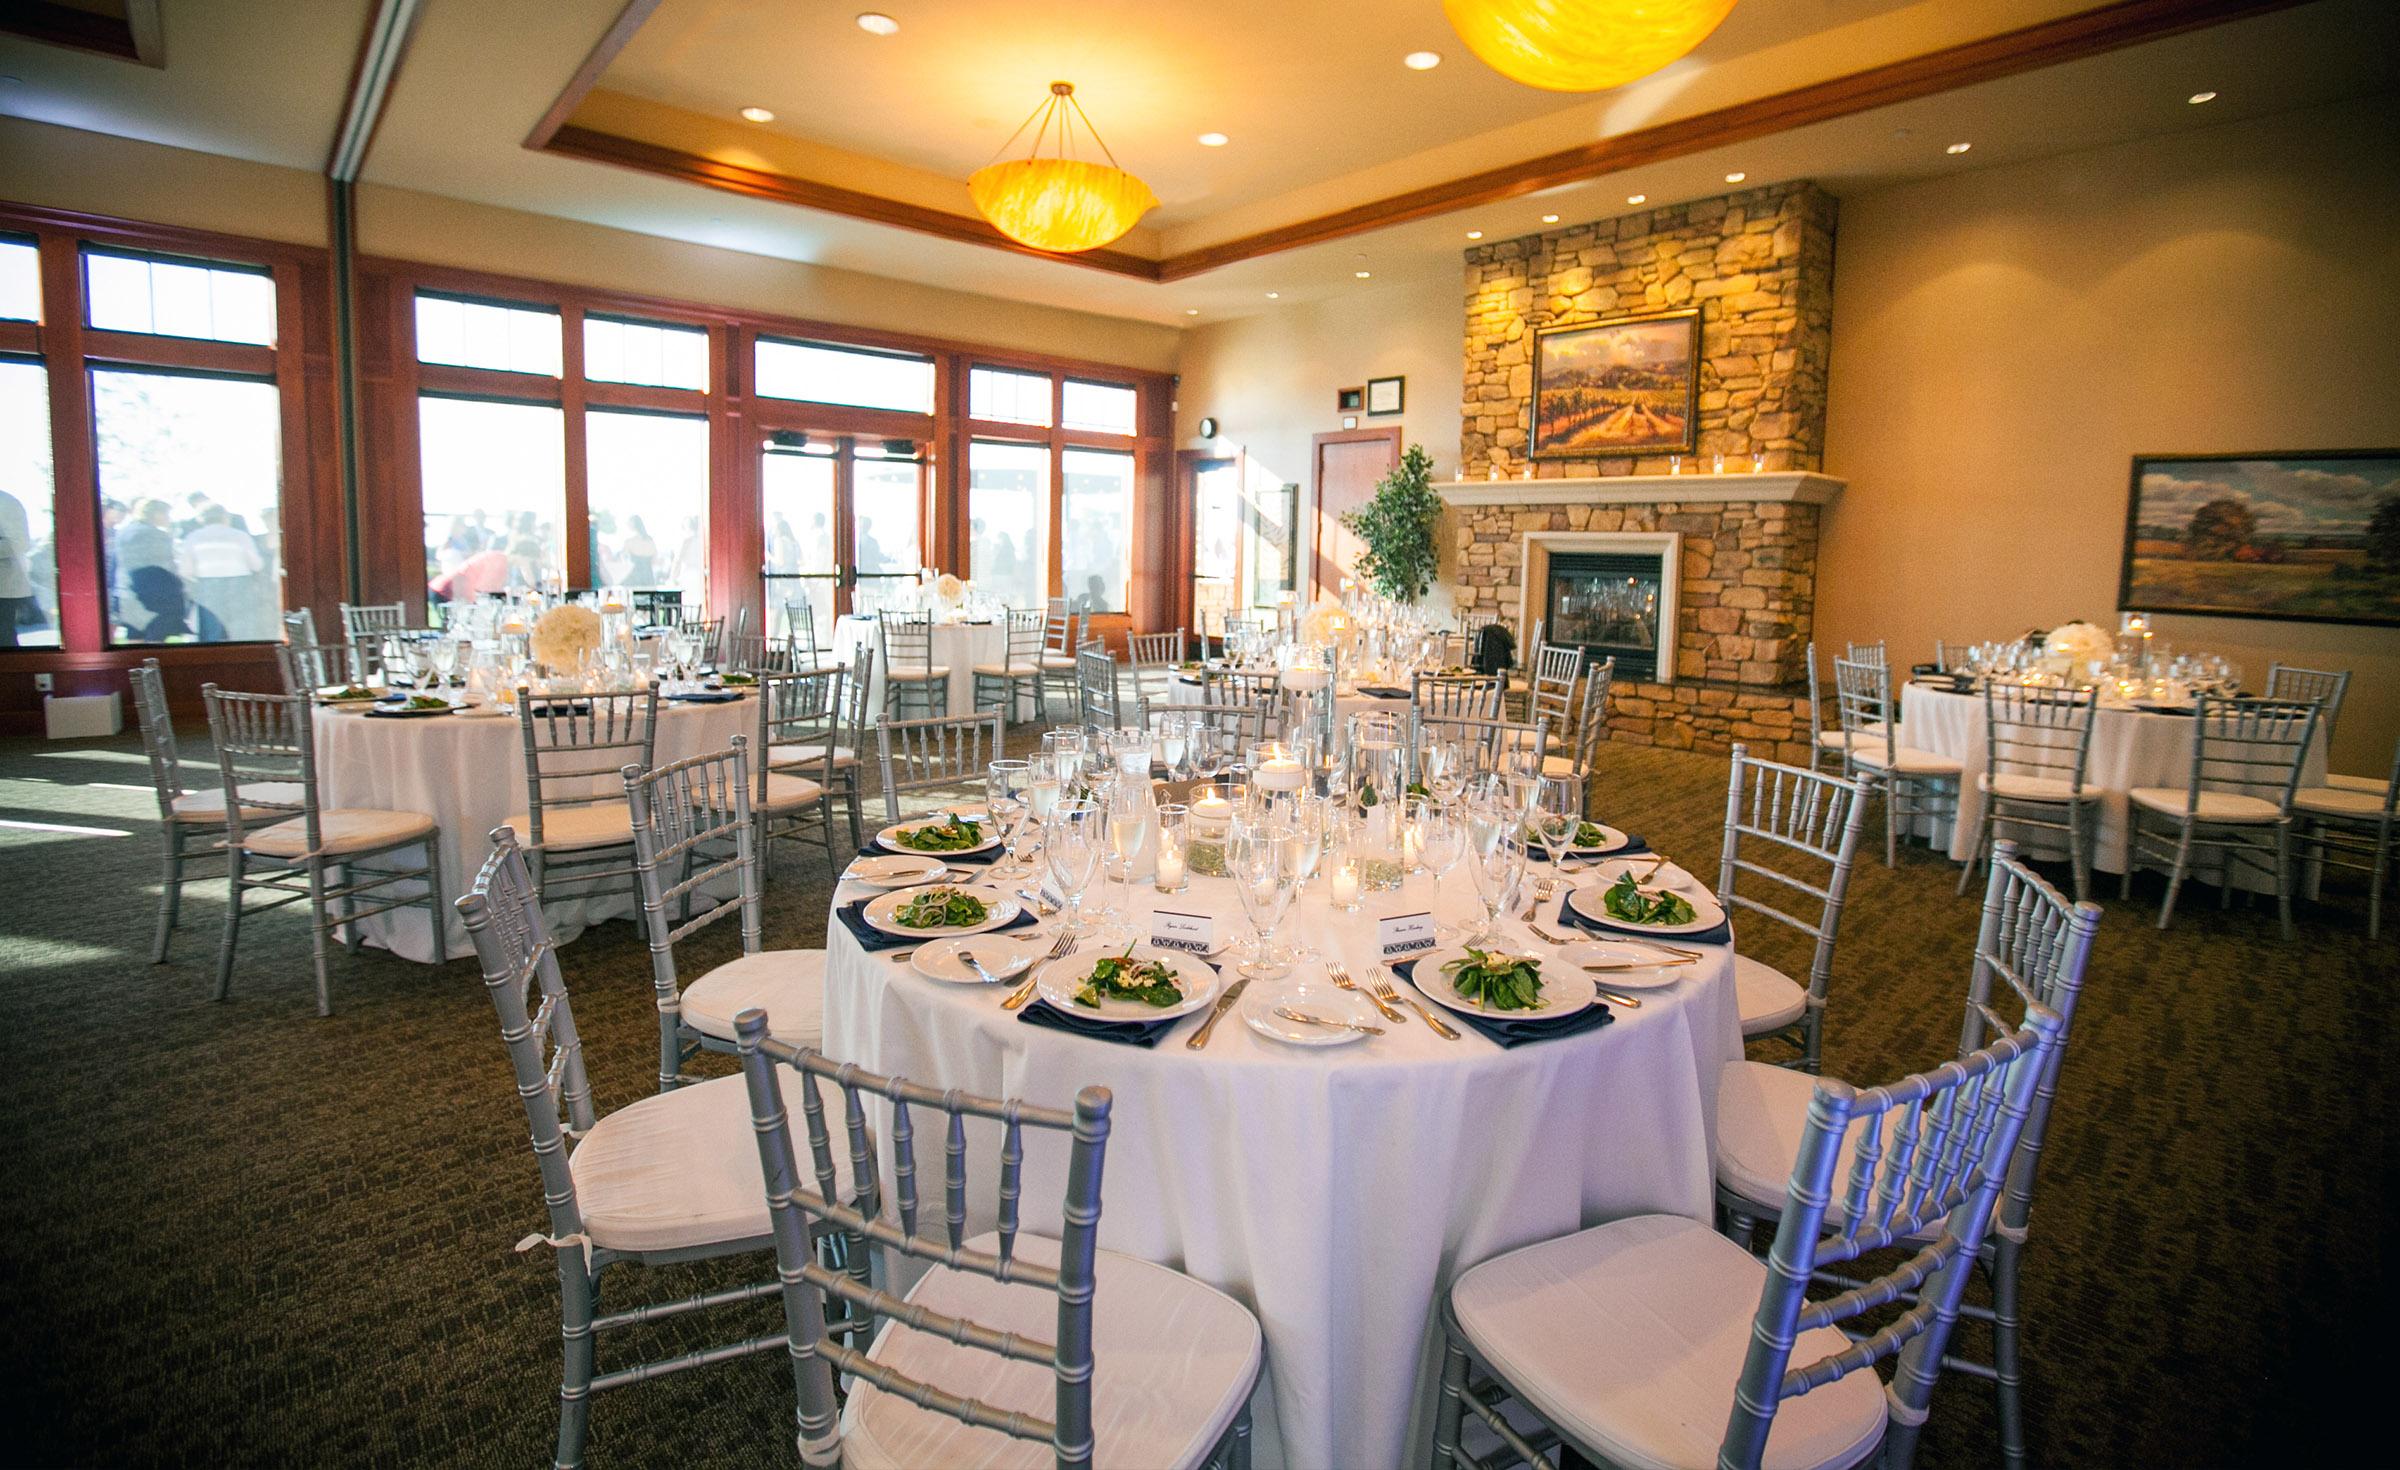 Elegant wedding reception with plenty of natural light - Boulder Ridge - Los Gatos, California - San Jose, California - Santa Clara County - Wedgewood Weddings